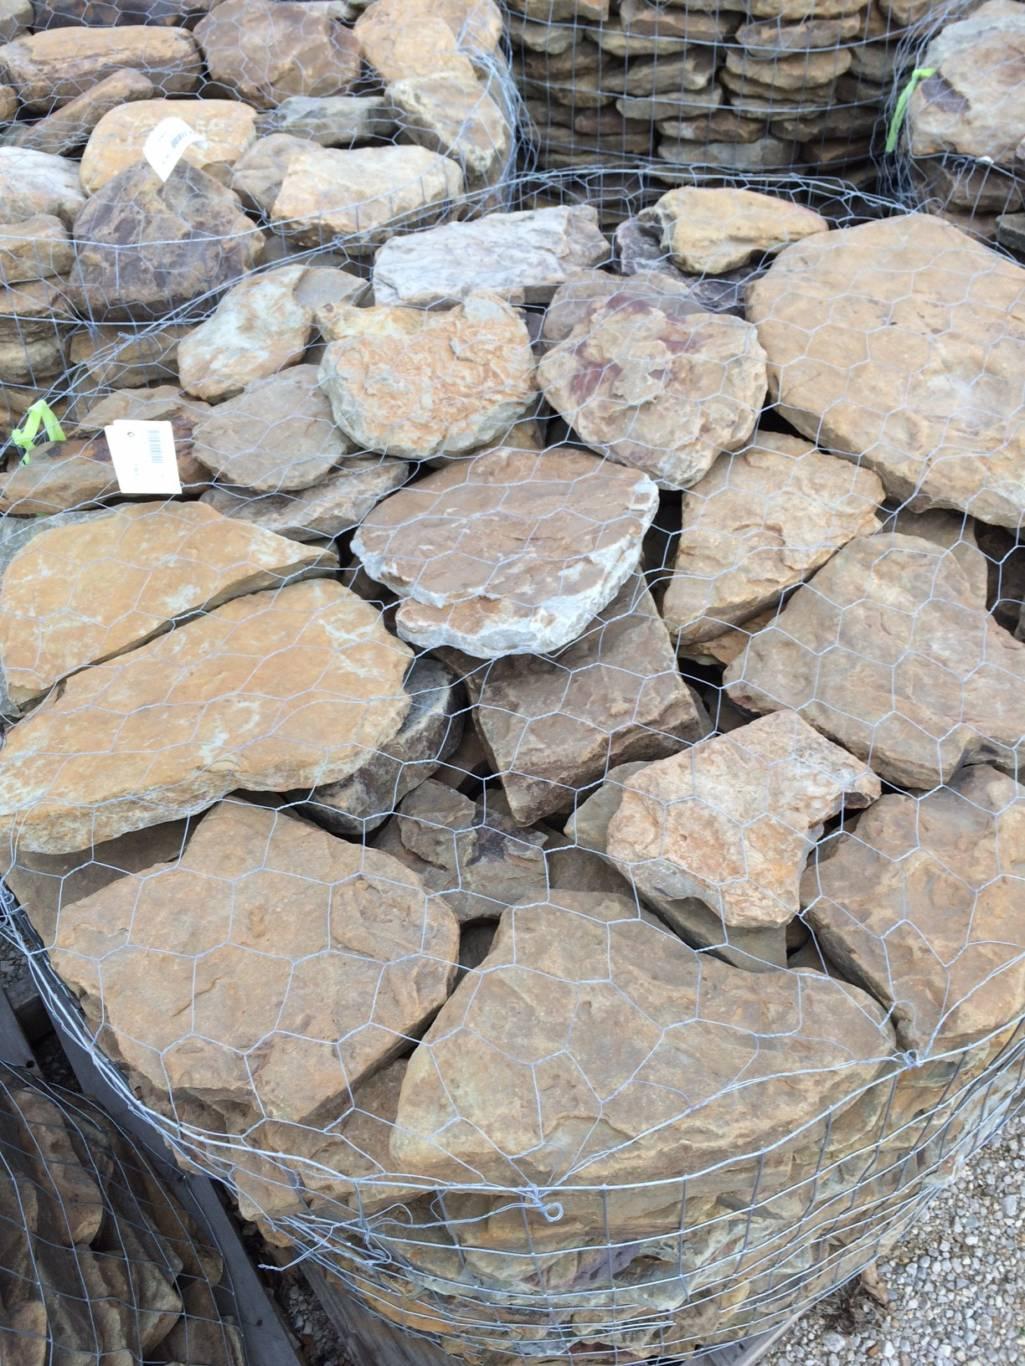 Earthworks Natural Stone : Boggy creek flats earthworks natural stone